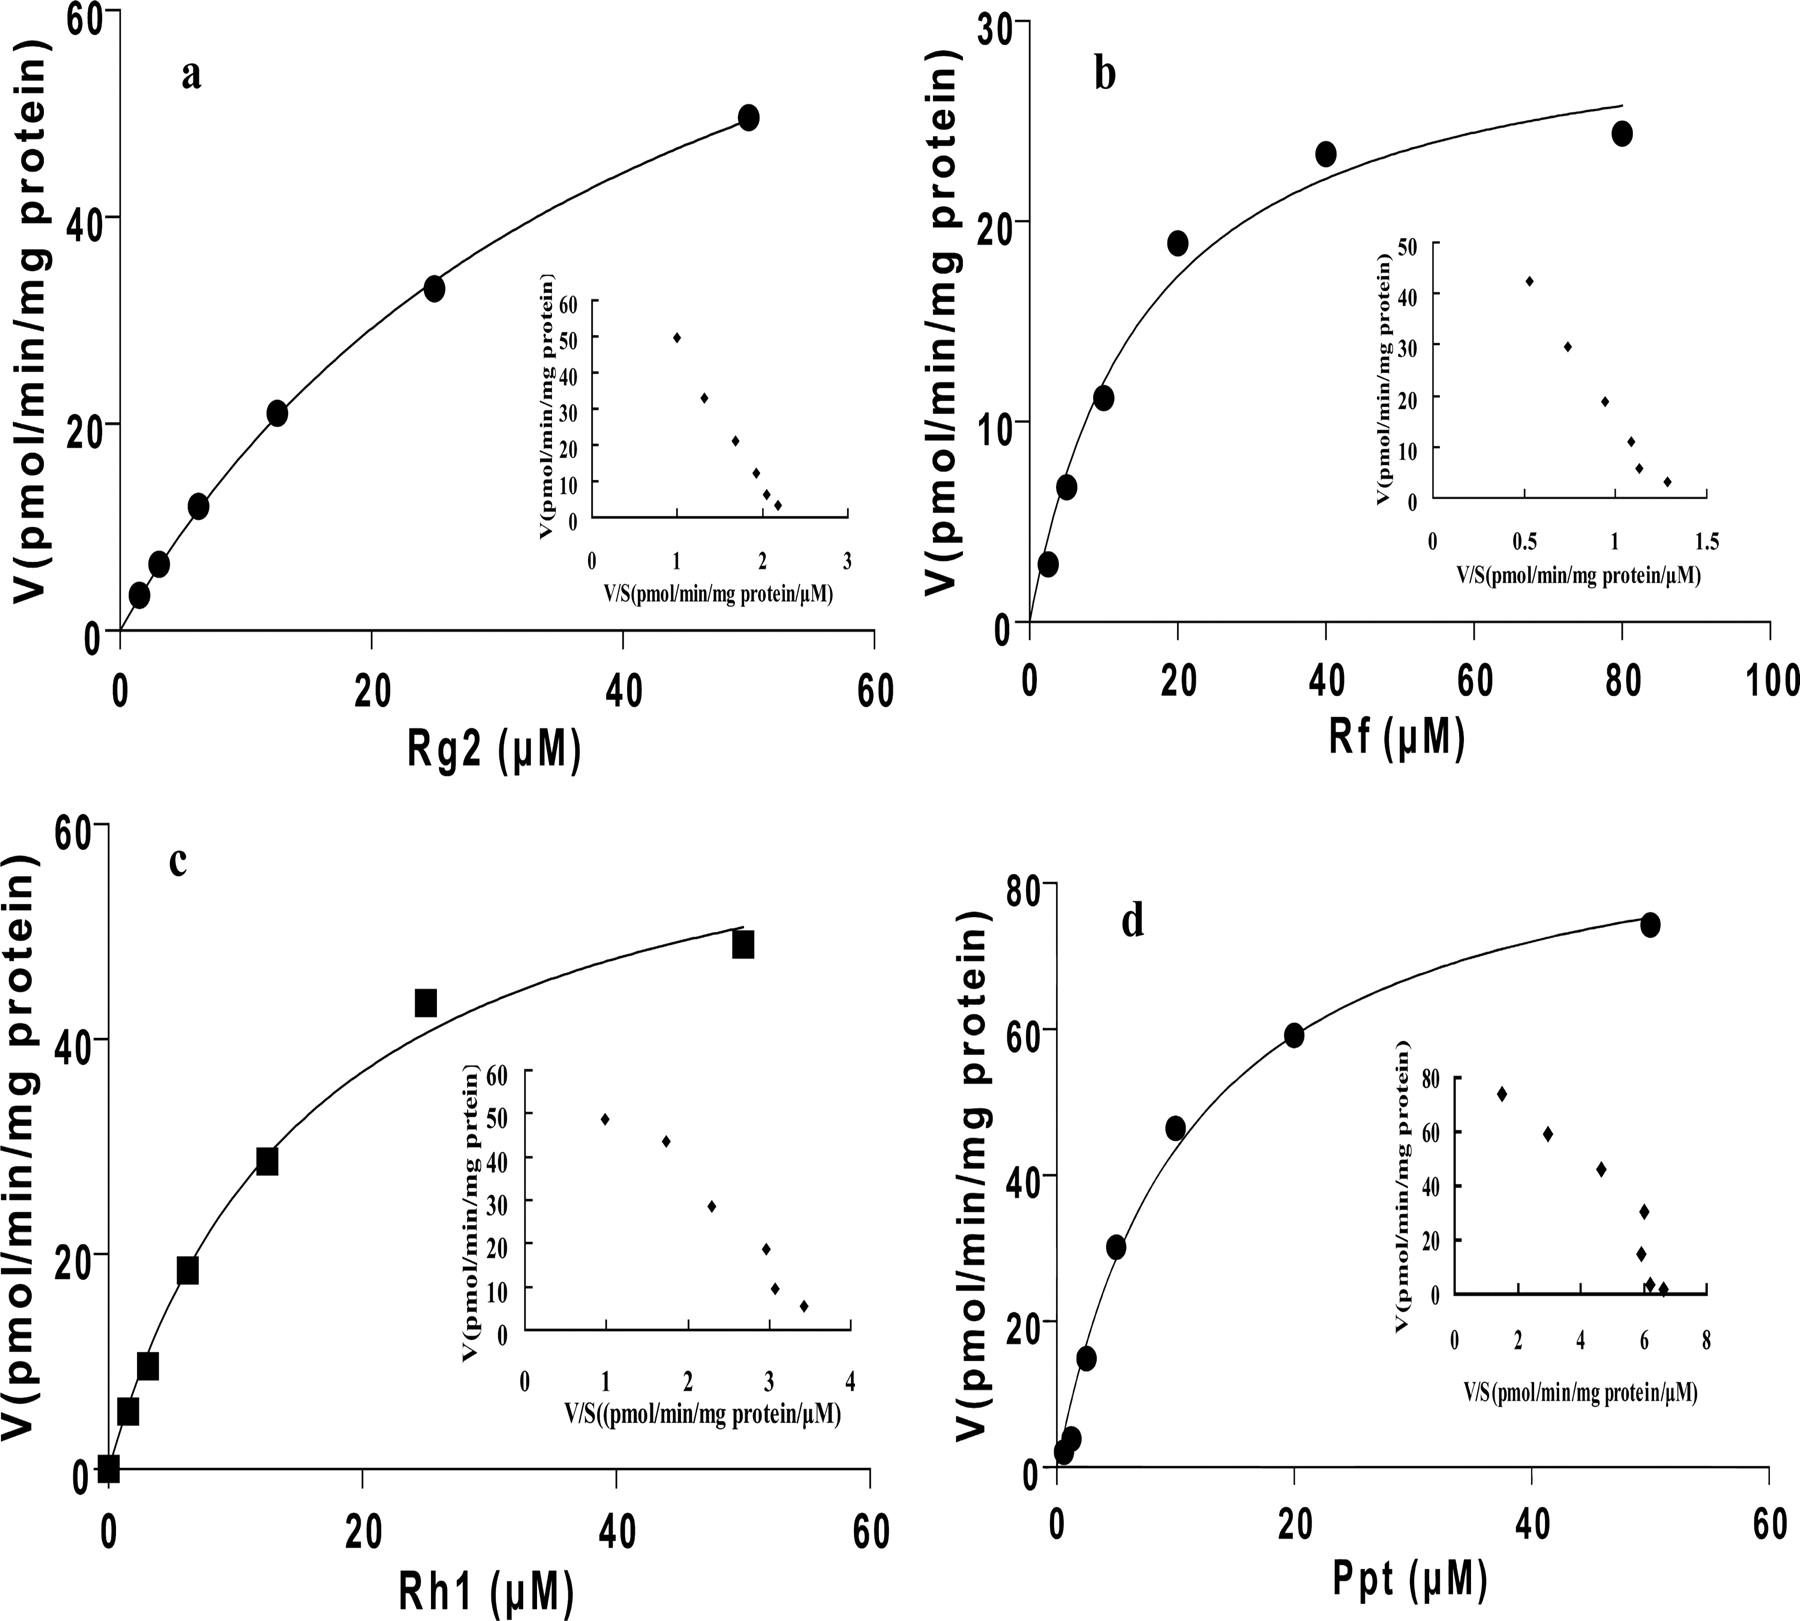 Microsomal Cytochrome P450 Mediated Metabolism Of Protopanaxatriol Rat Skeleton Diagram Download Figure